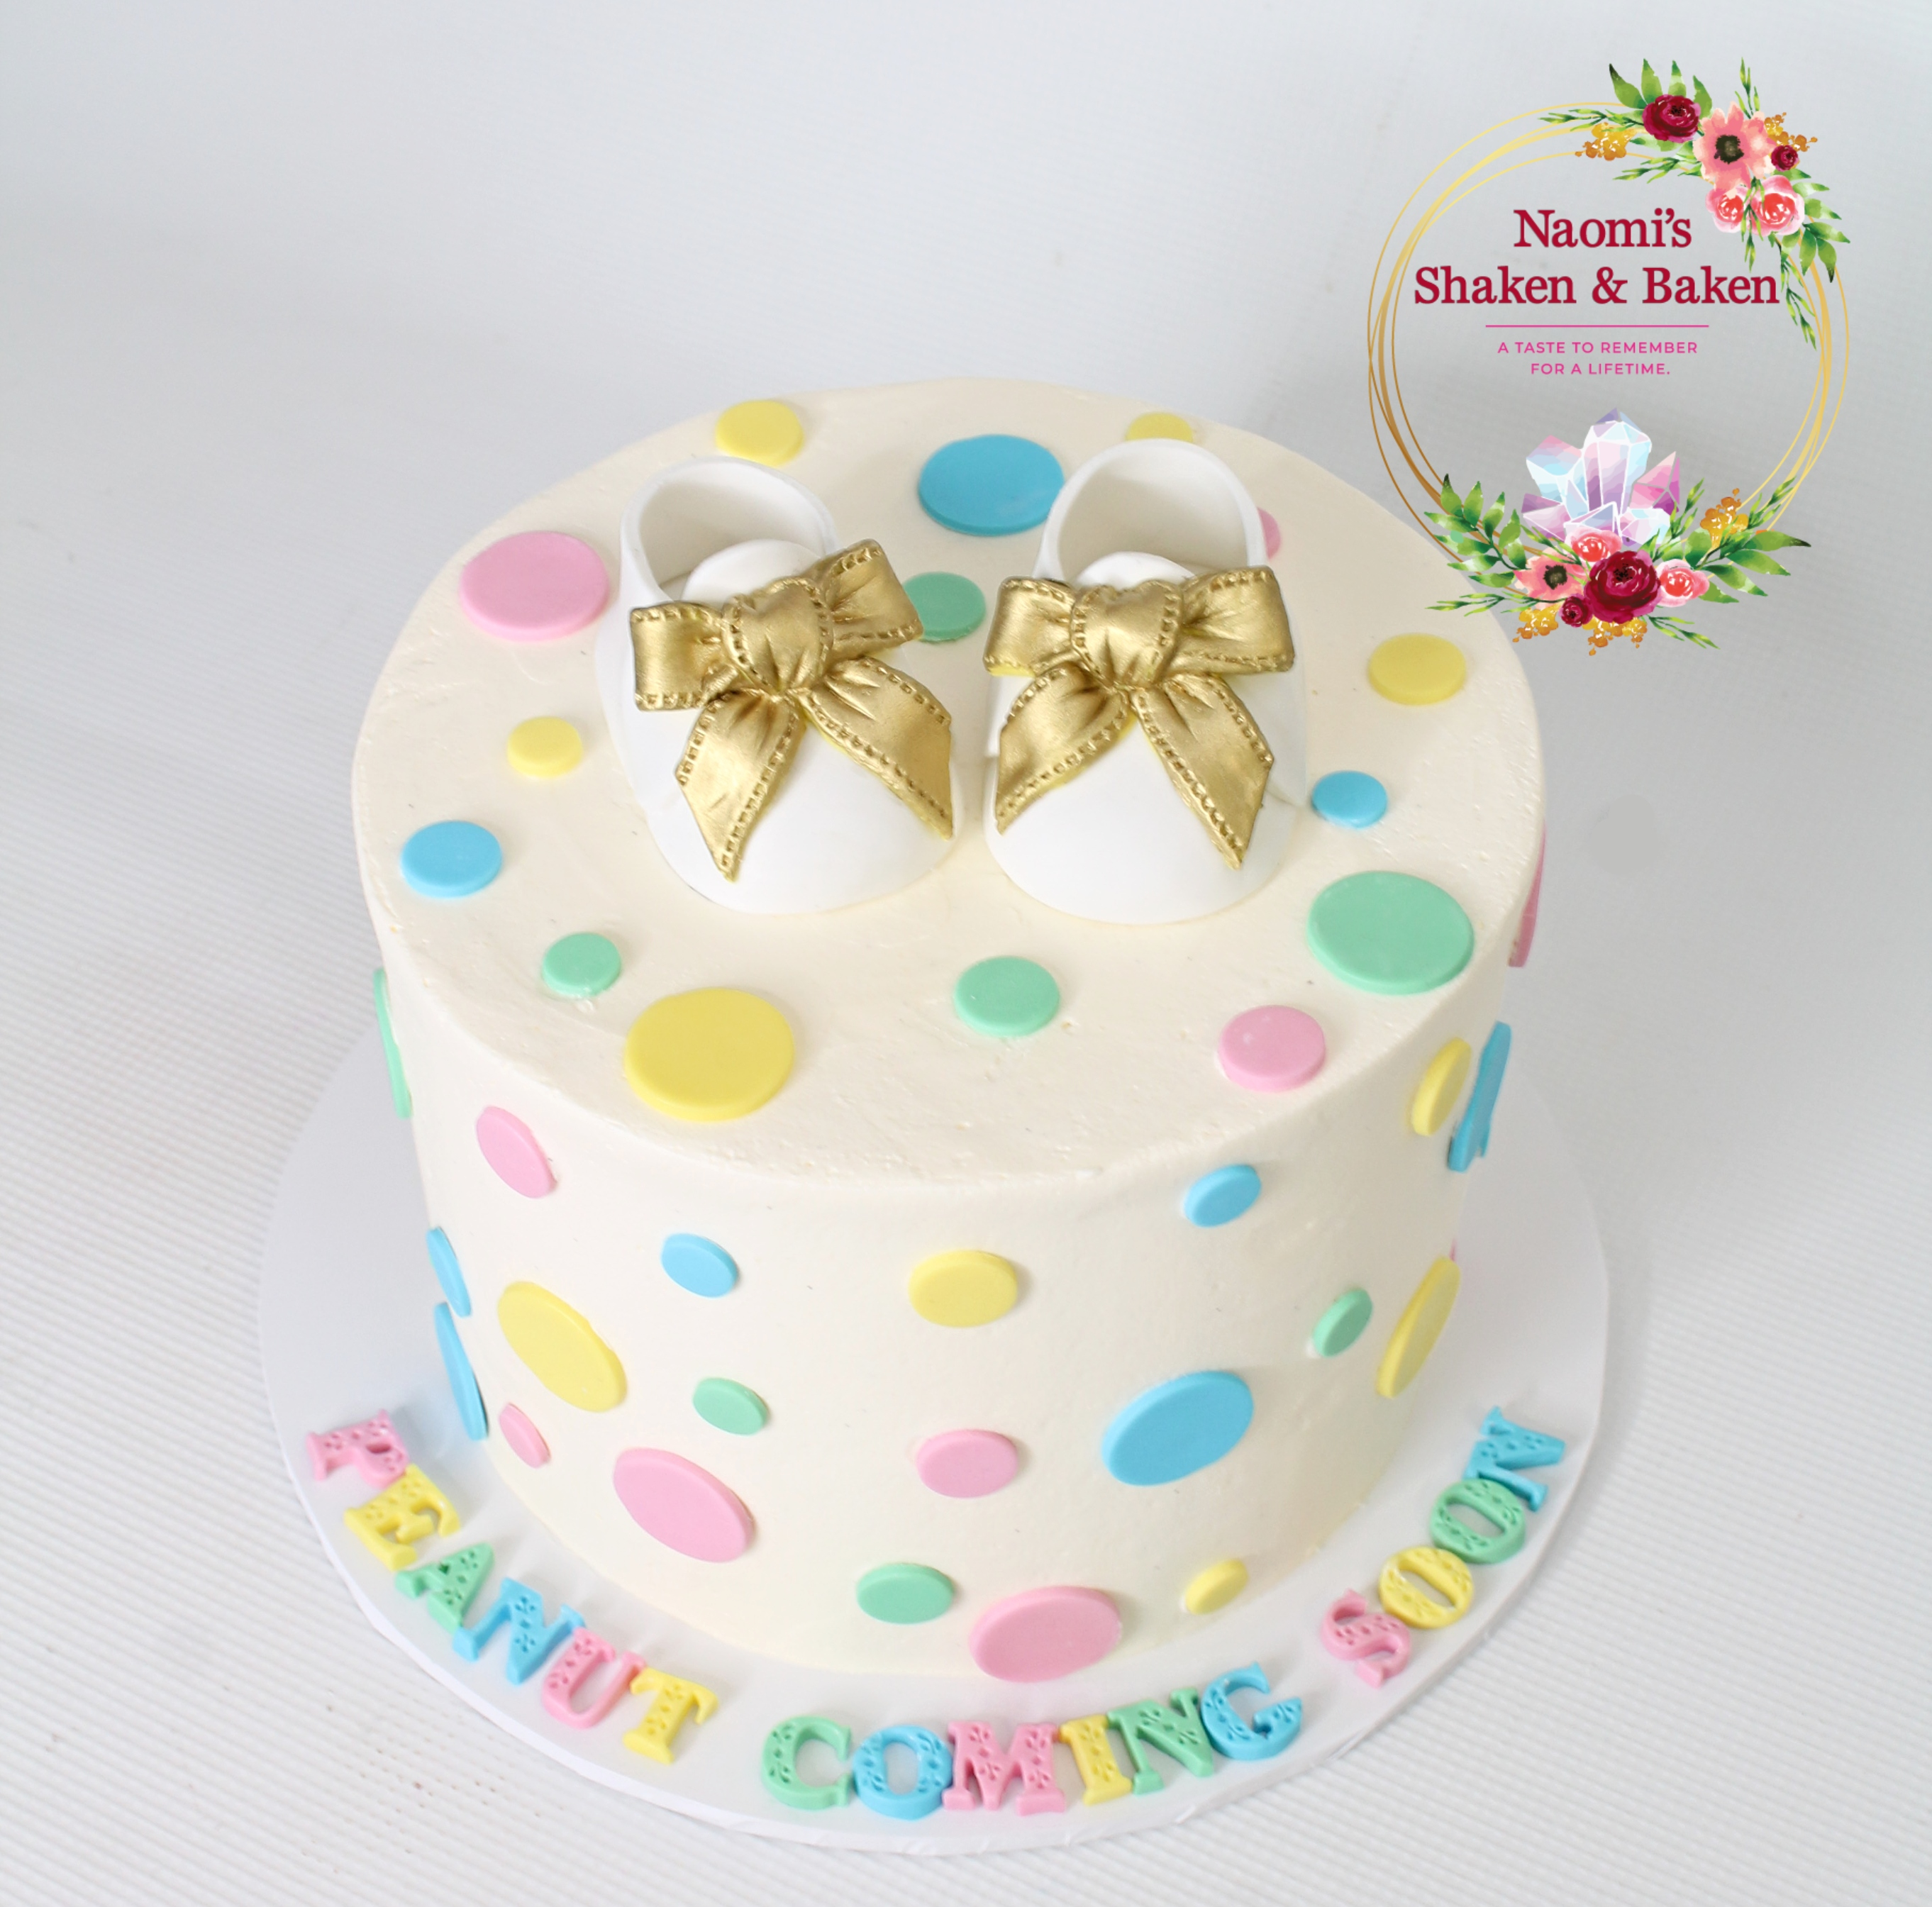 Baby Shower Cake Morayfield Caboolrture